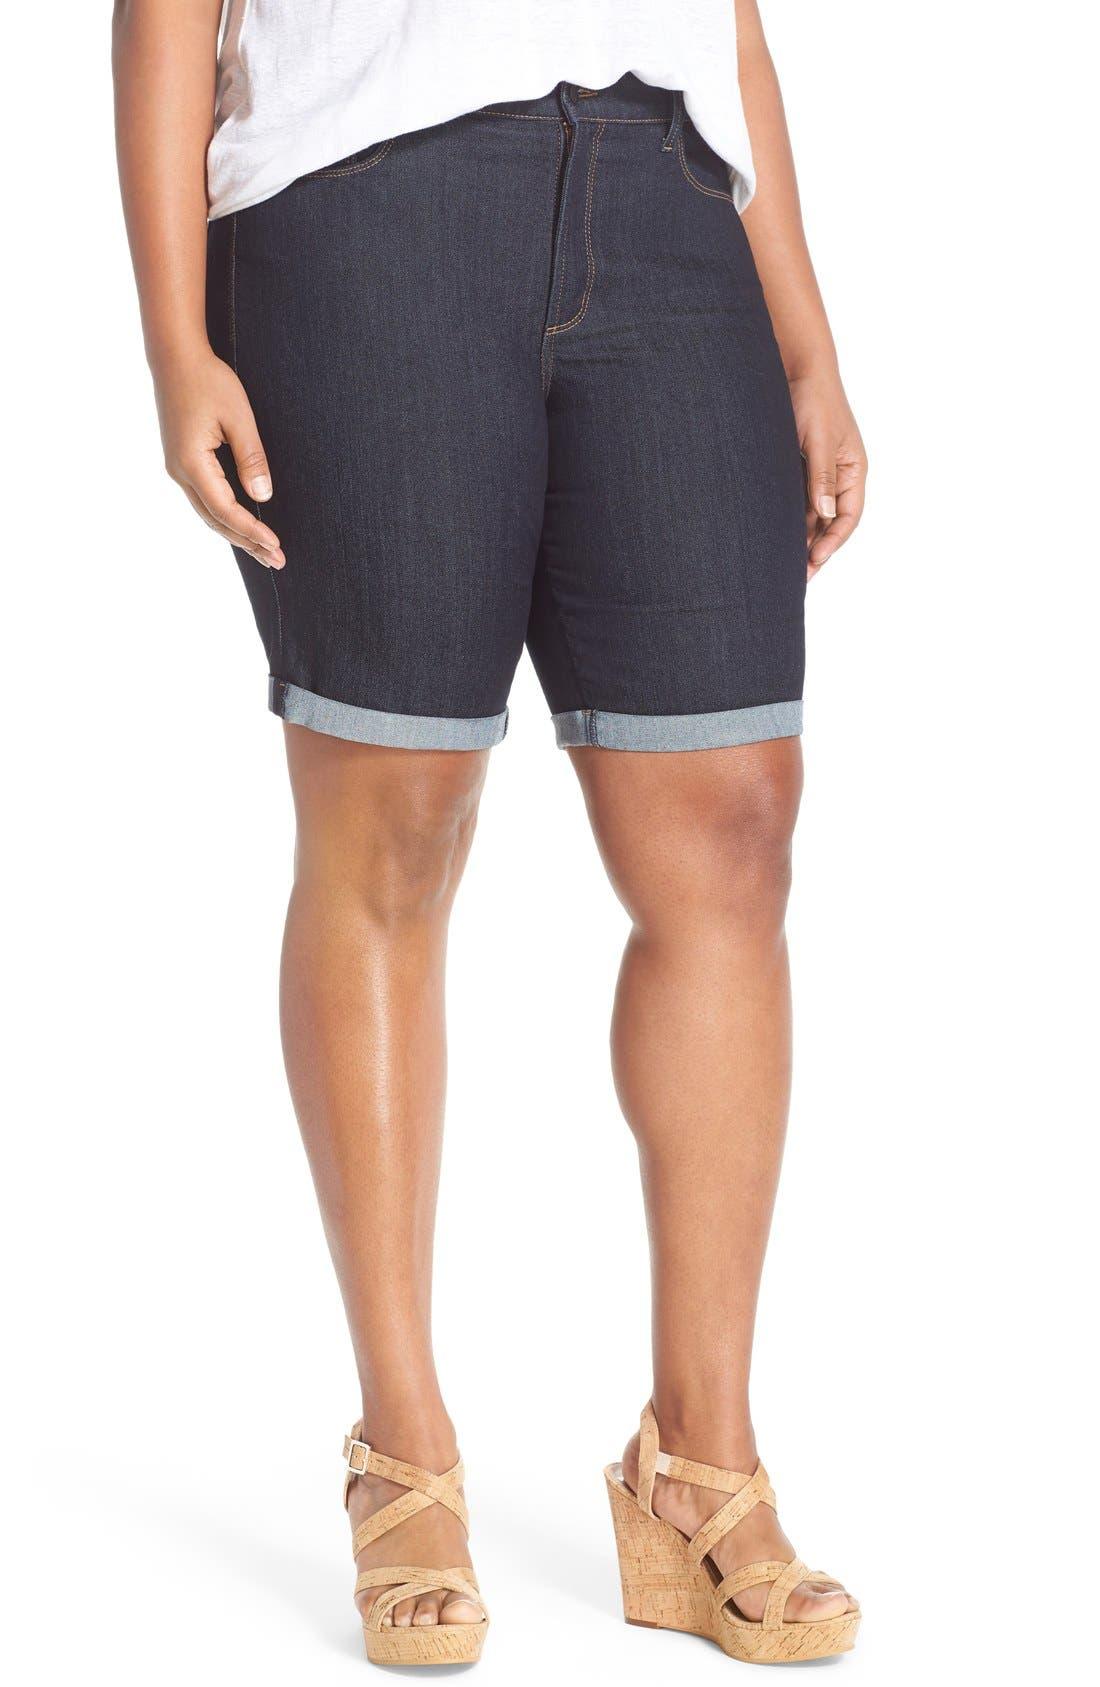 Main Image - NYDJ 'Briella' Stretch Roll Cuff Denim Shorts (Dark) (Plus Size)